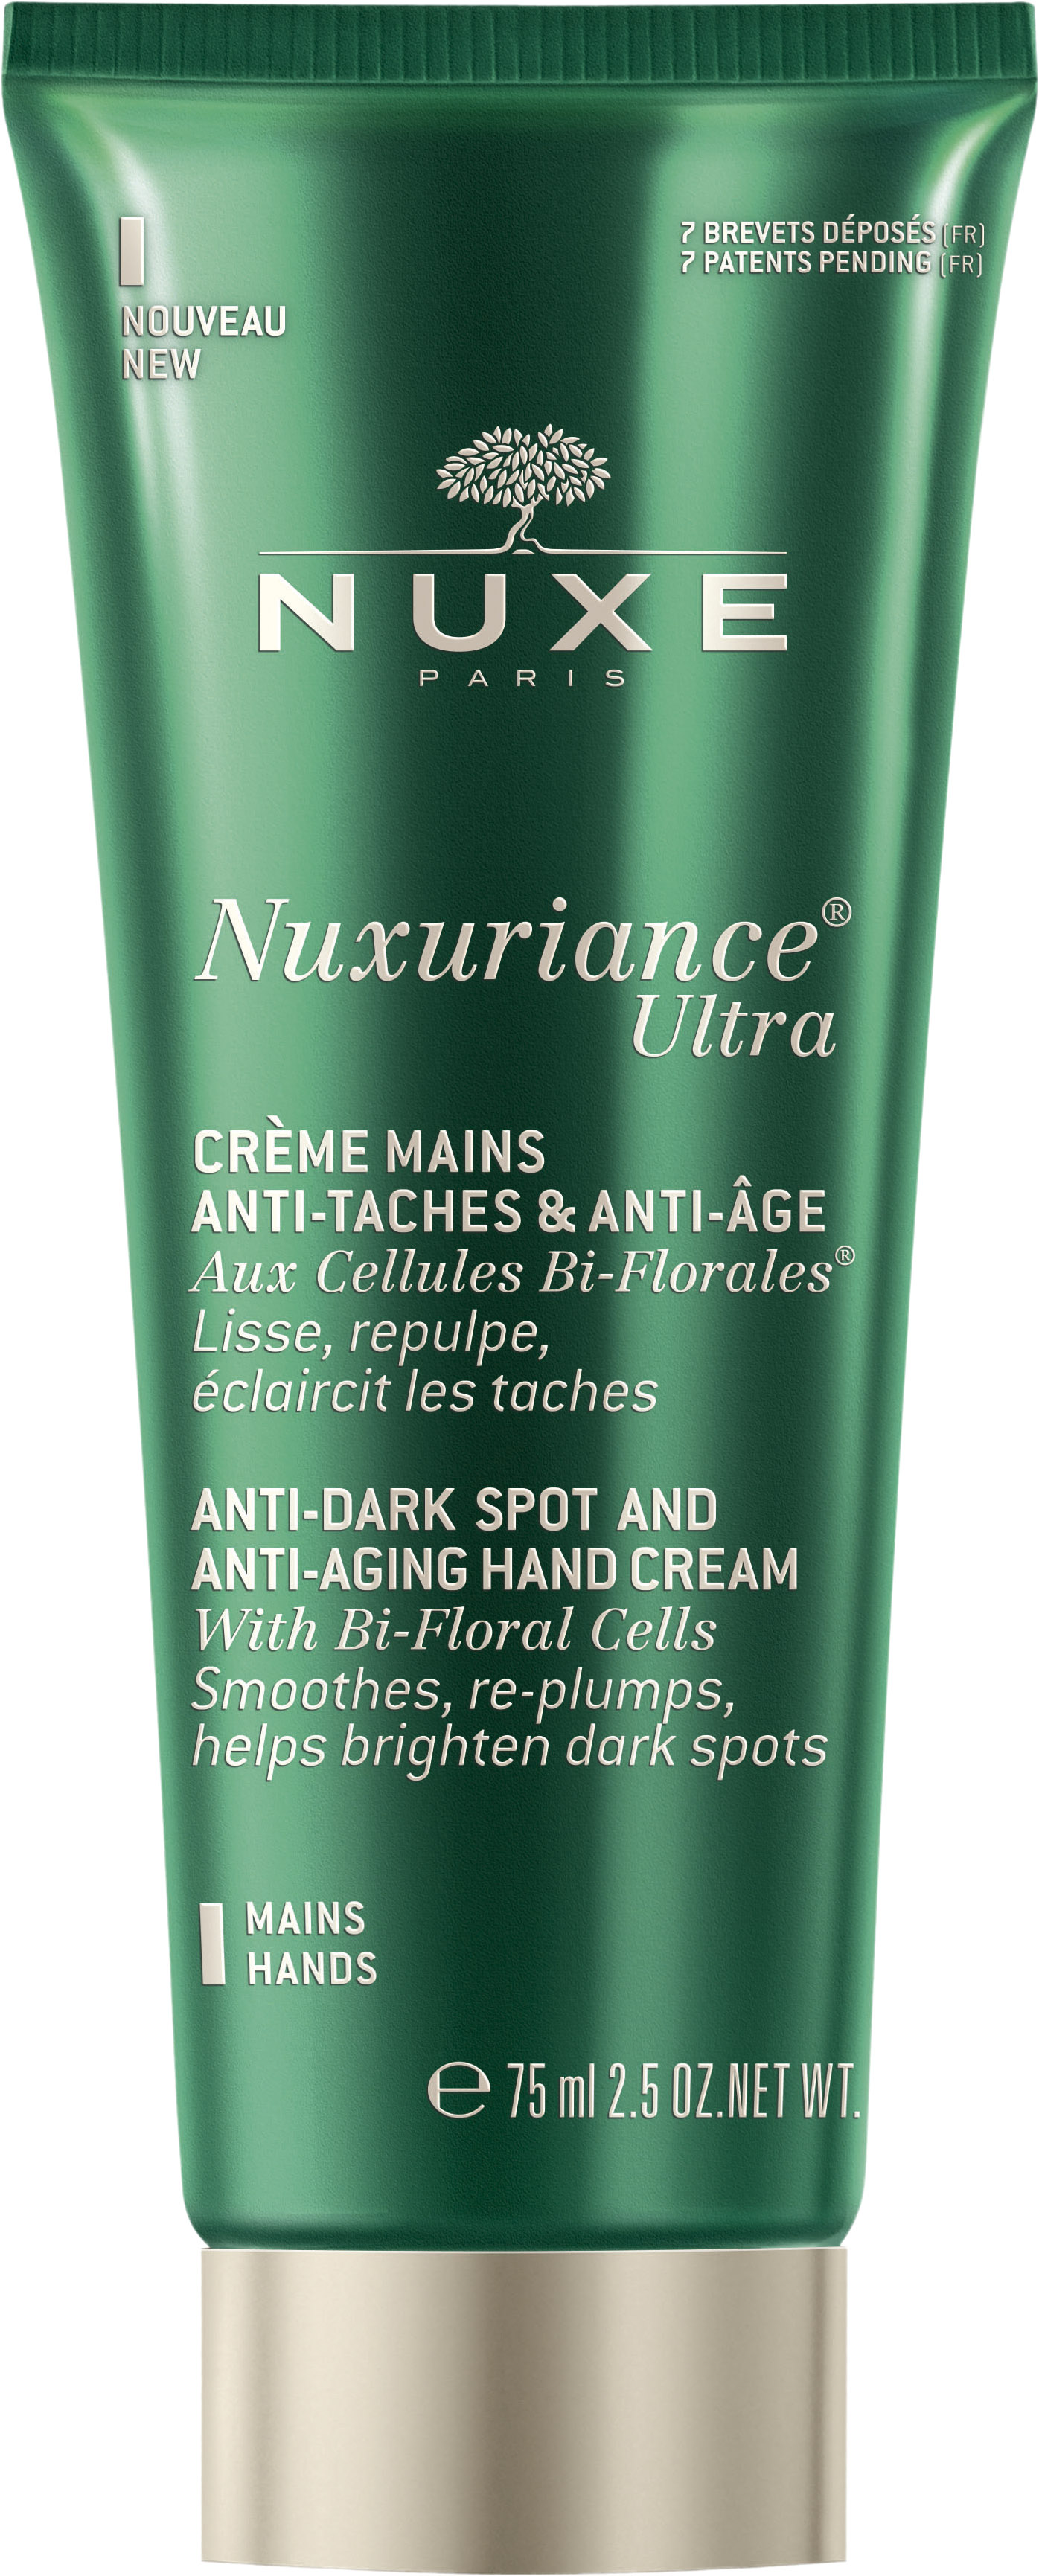 Nuxe Nuxuriance Ultra Hand Cream, 75 ml